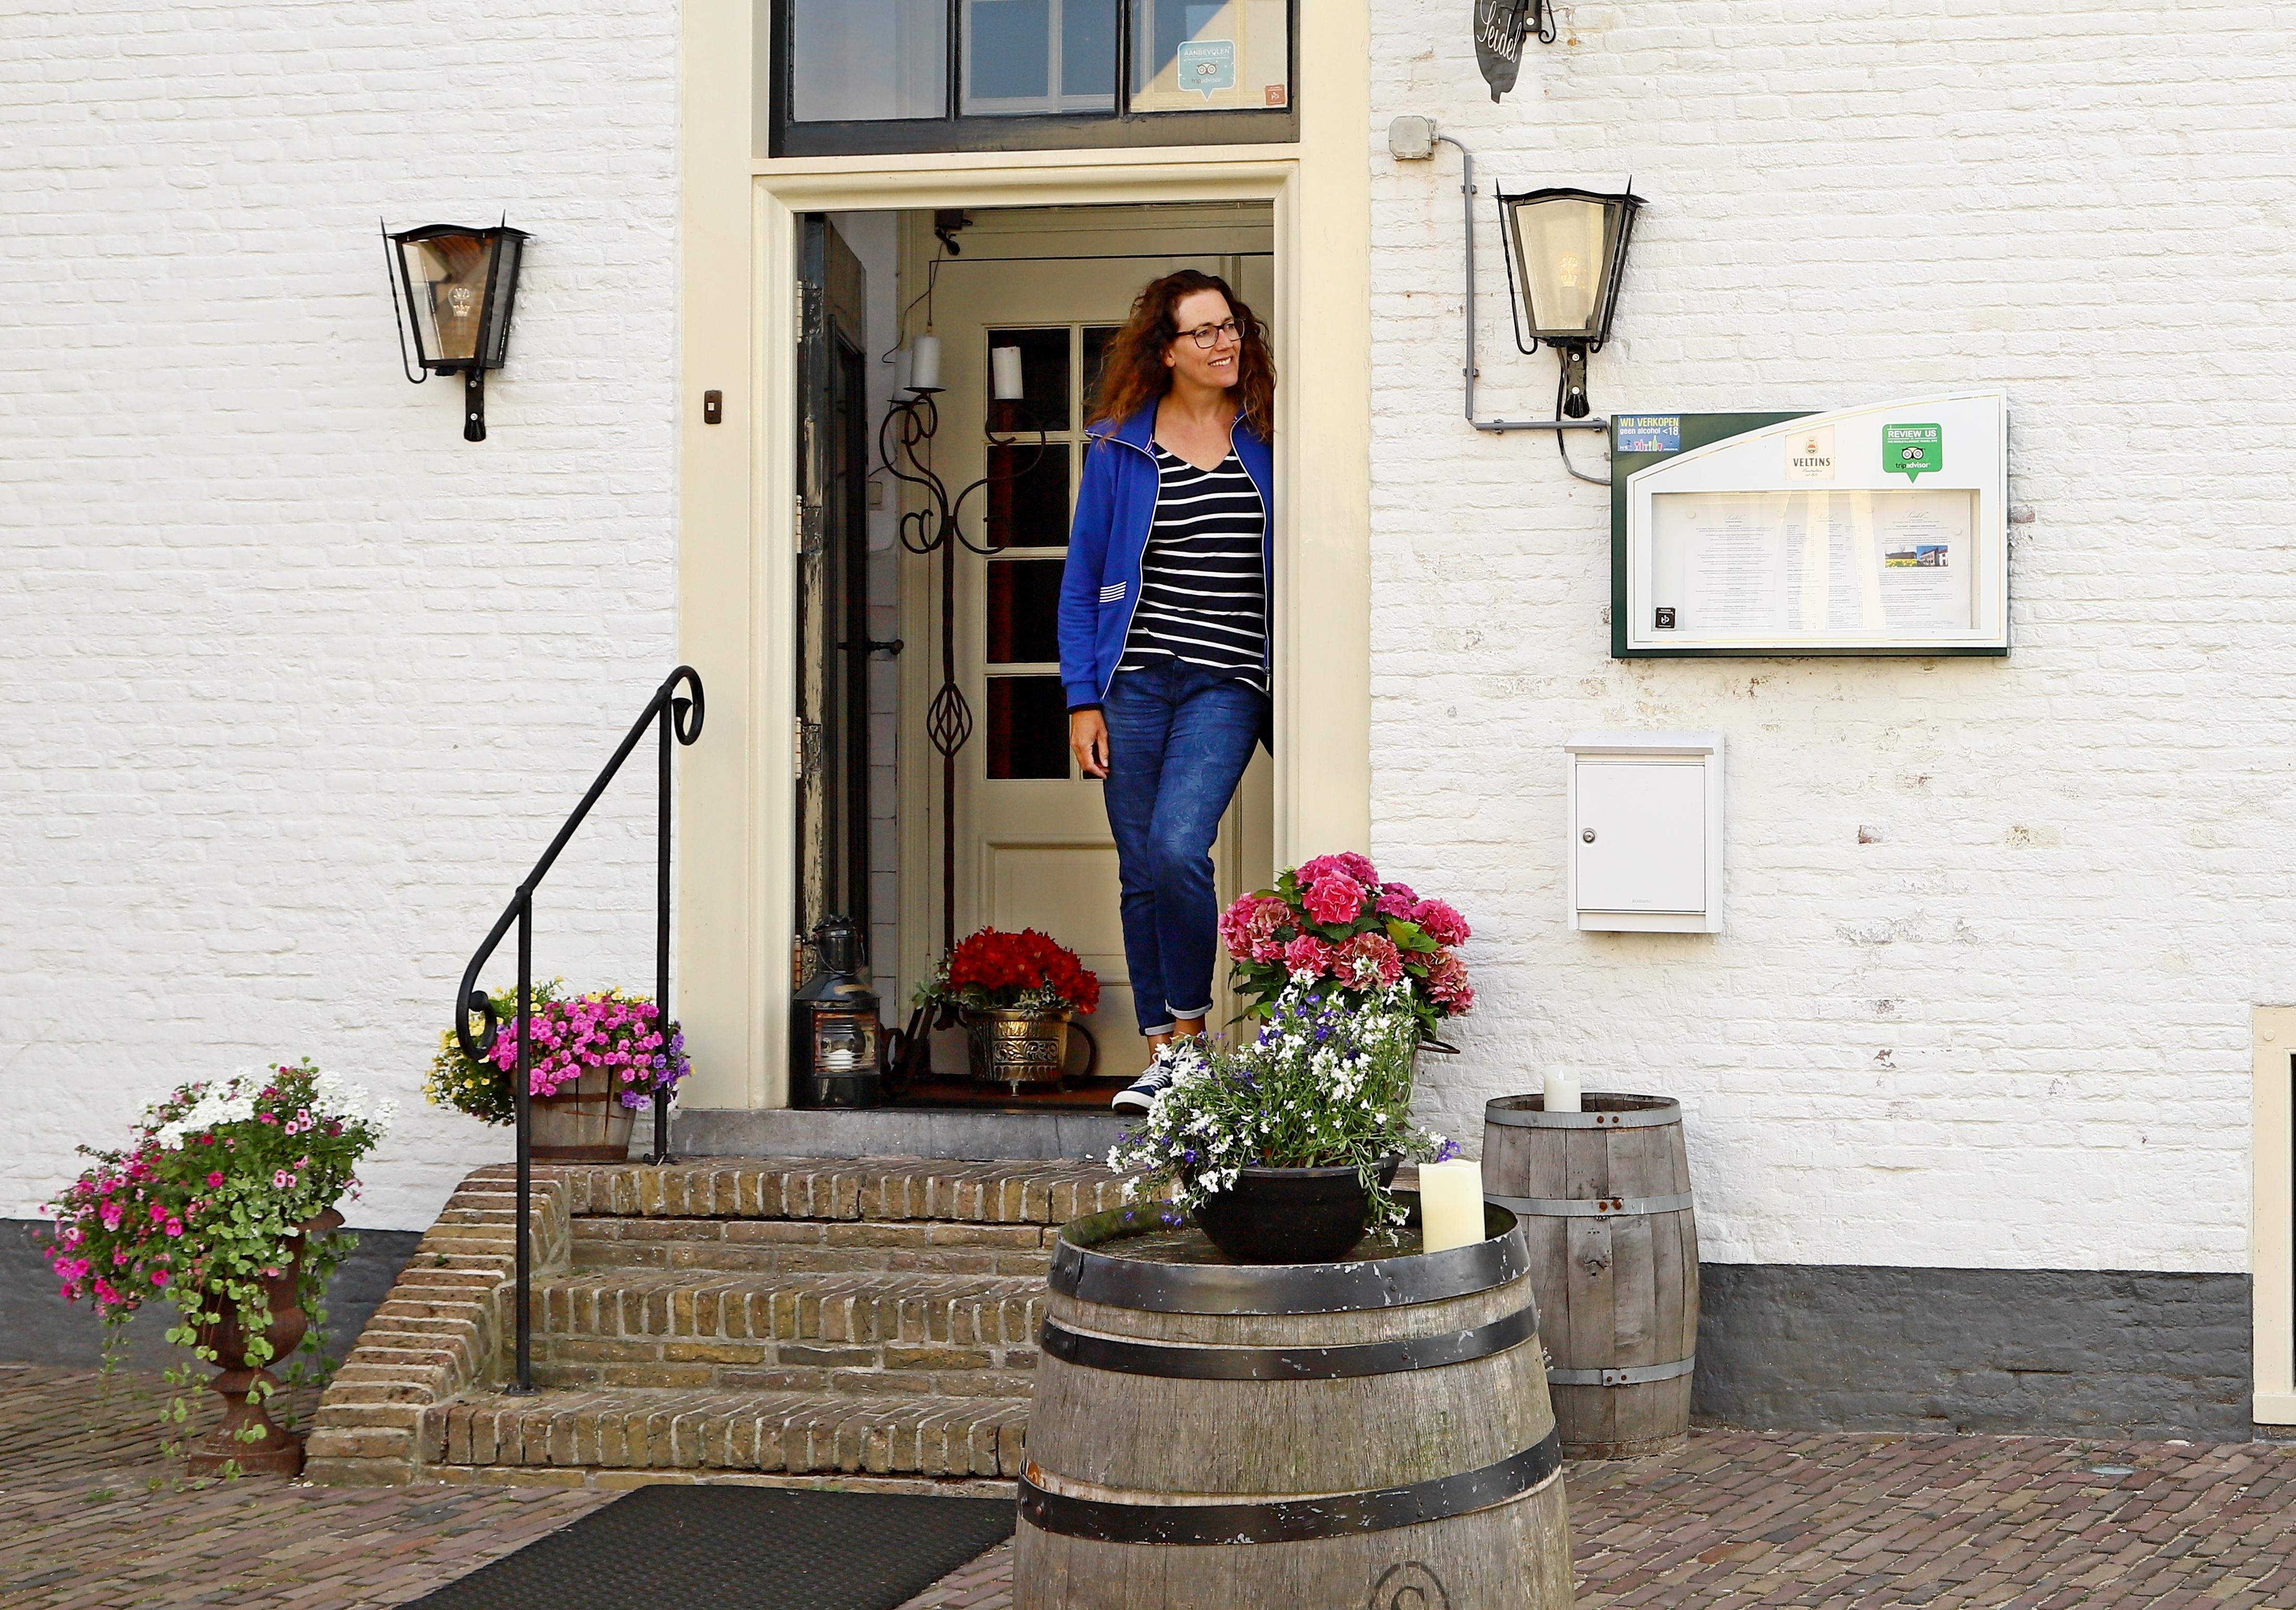 Sybylle in de deur van herberg Seidel in Vollenhove.